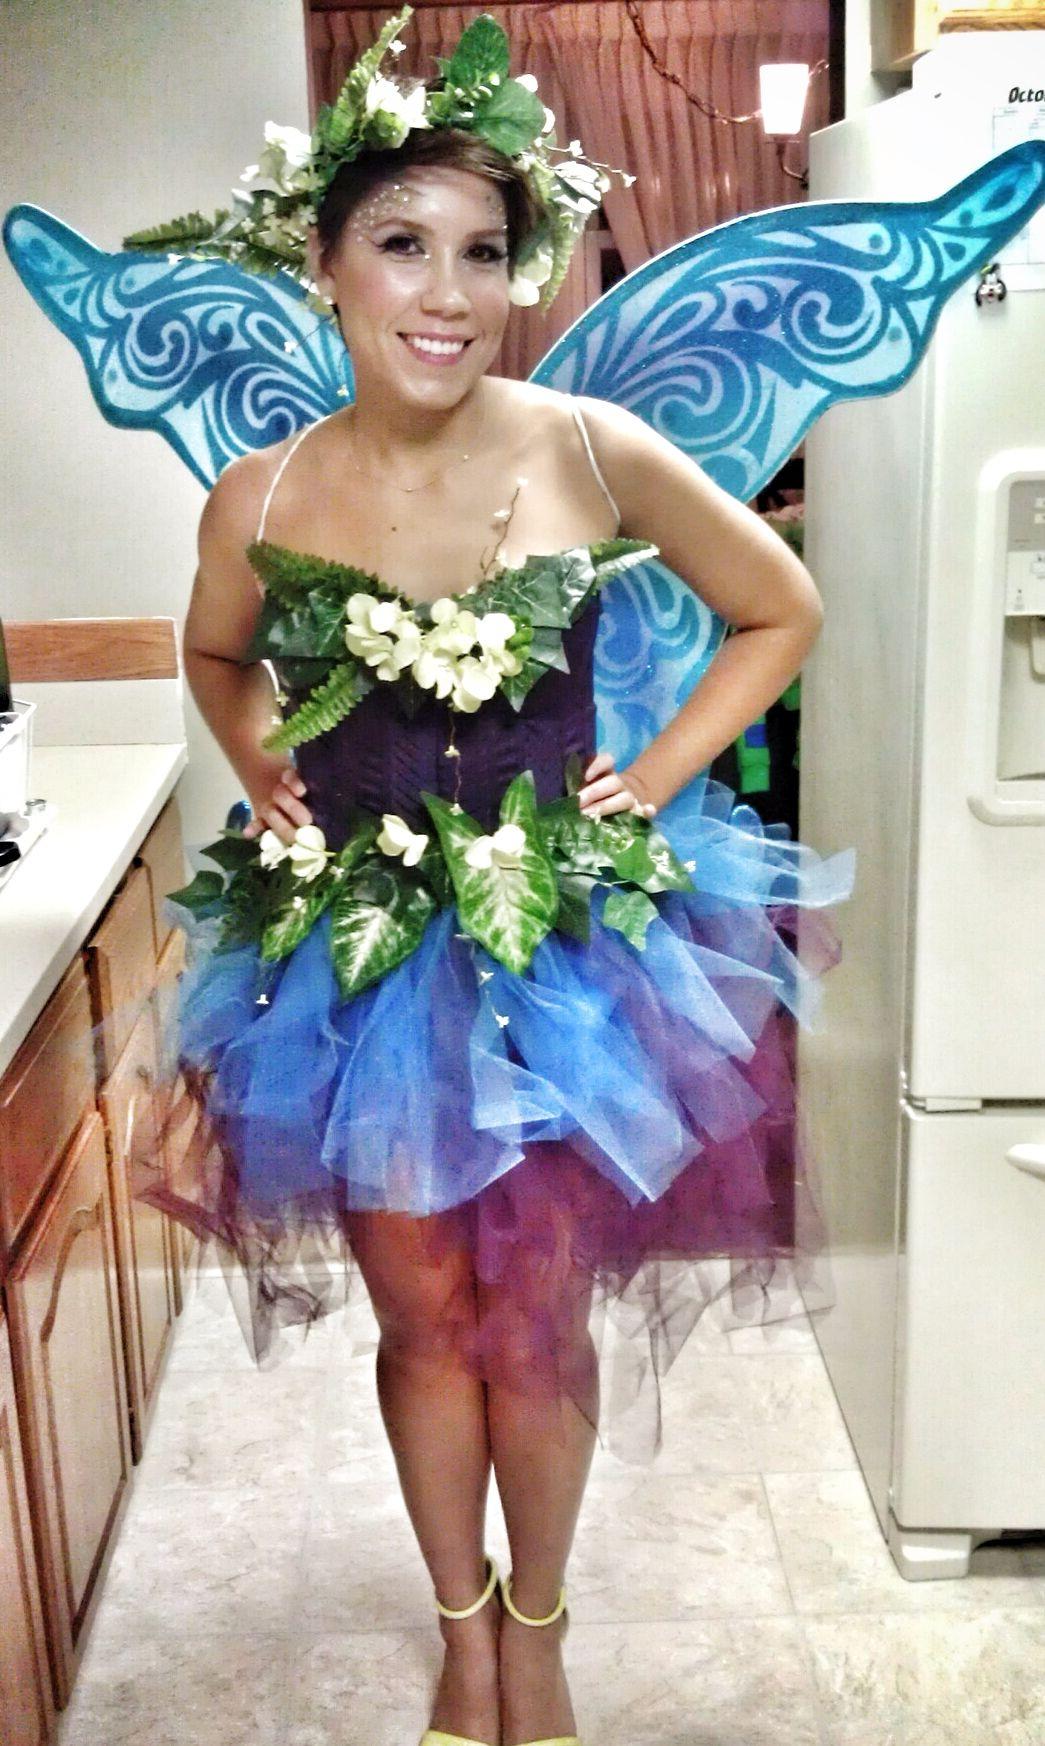 Fairy Costume Halloween Diy In 2019 Fairy Costume Diy